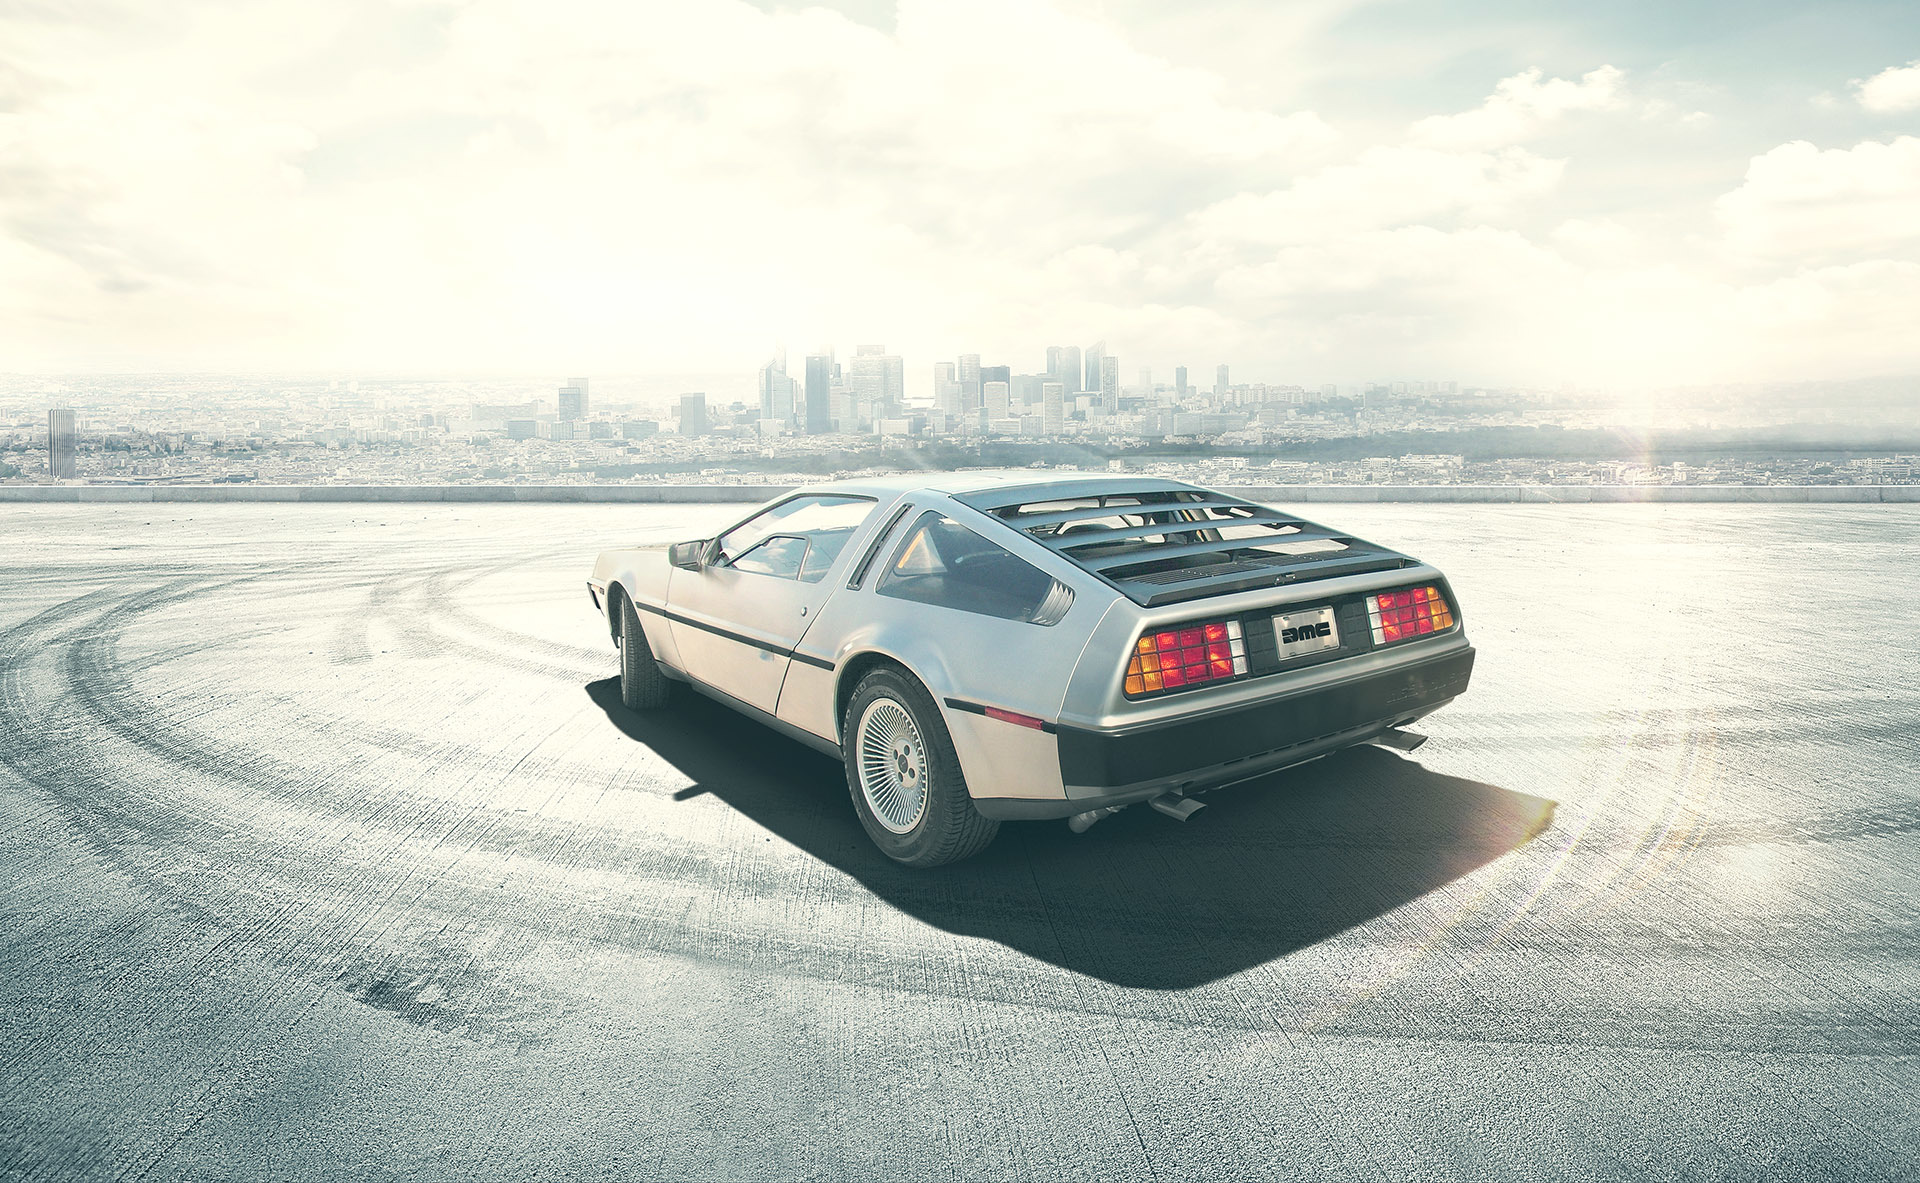 DeLorean DMC-12 Is Back, Pre-orders Now Open